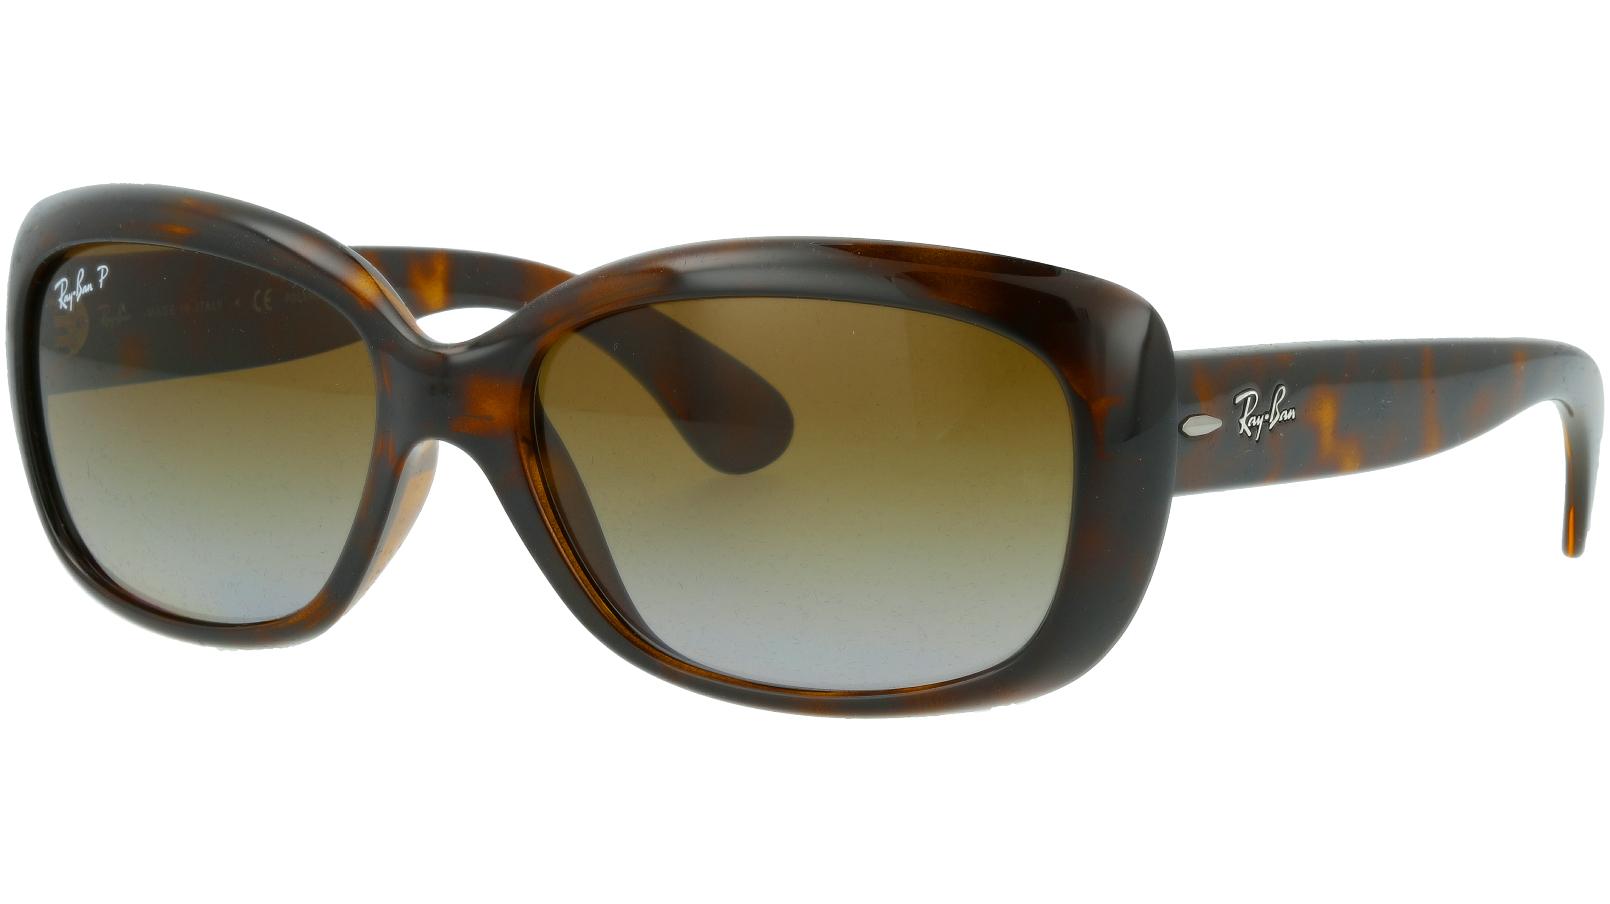 Ray-Ban RB4101 710/T5 Light Havana Polarized  Sunglasses